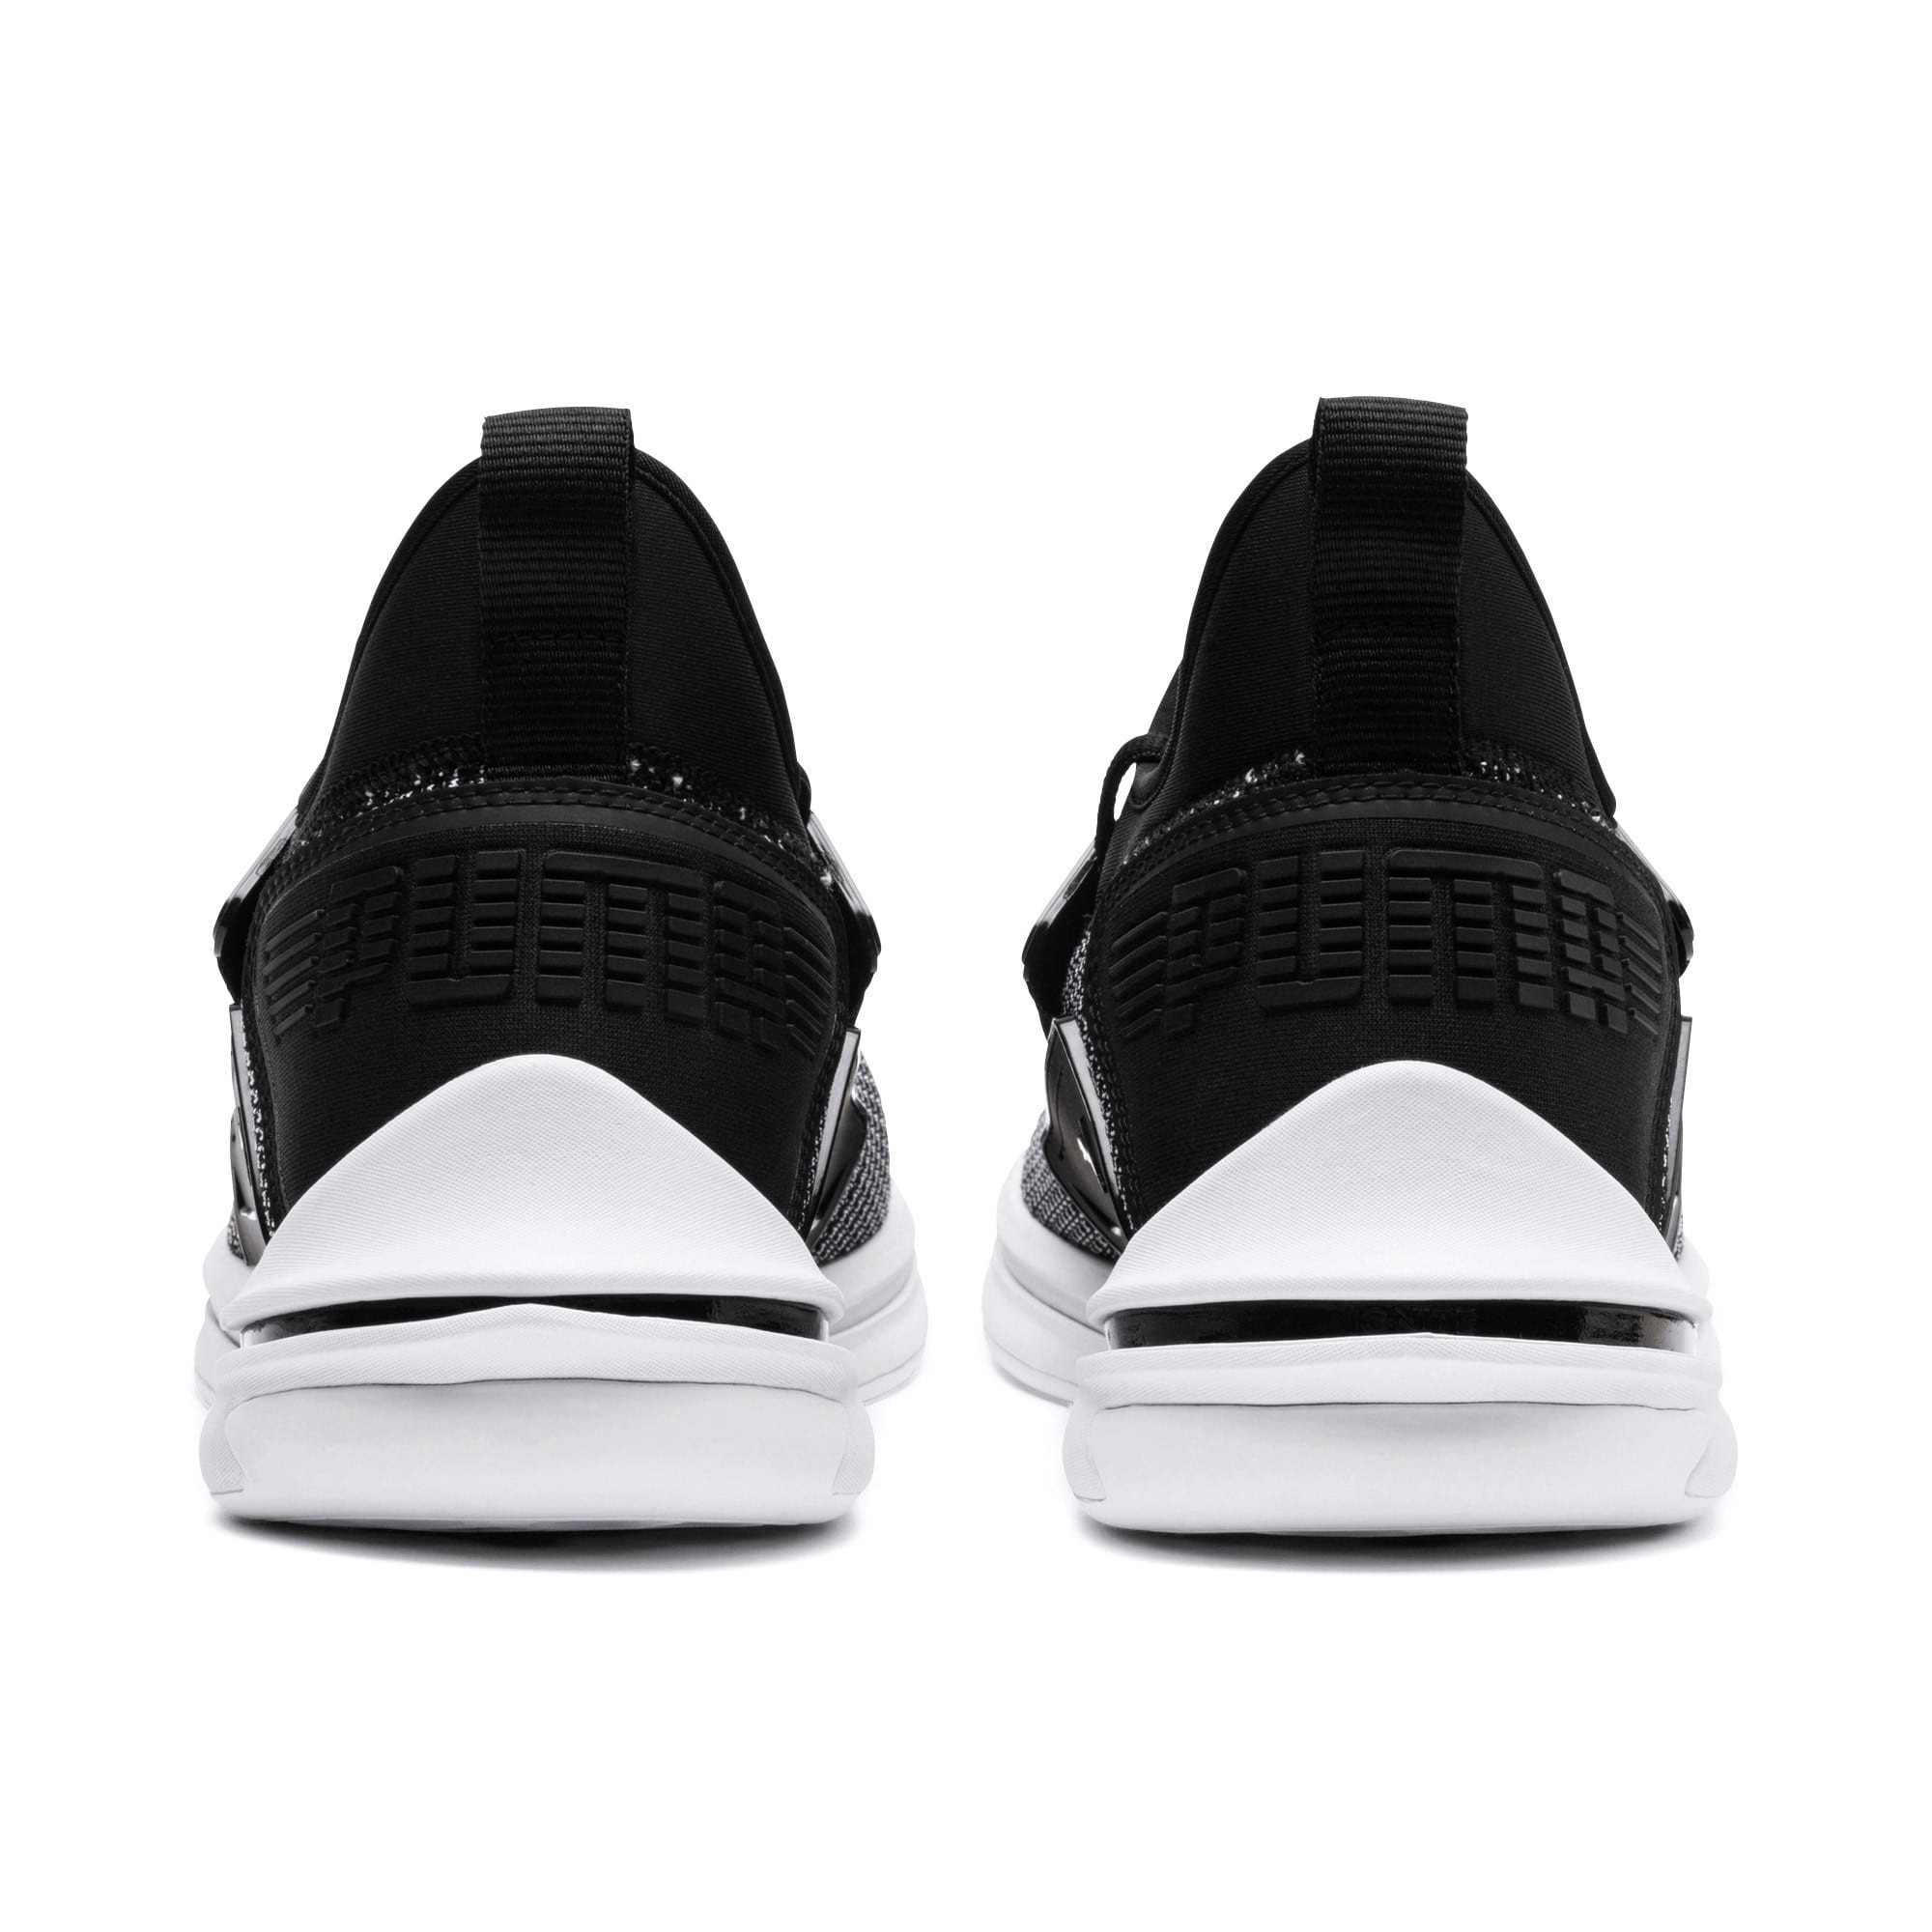 Thumbnail 4 of IGNITE Limitless SR New School Sneakers, Puma Black-Puma White, medium